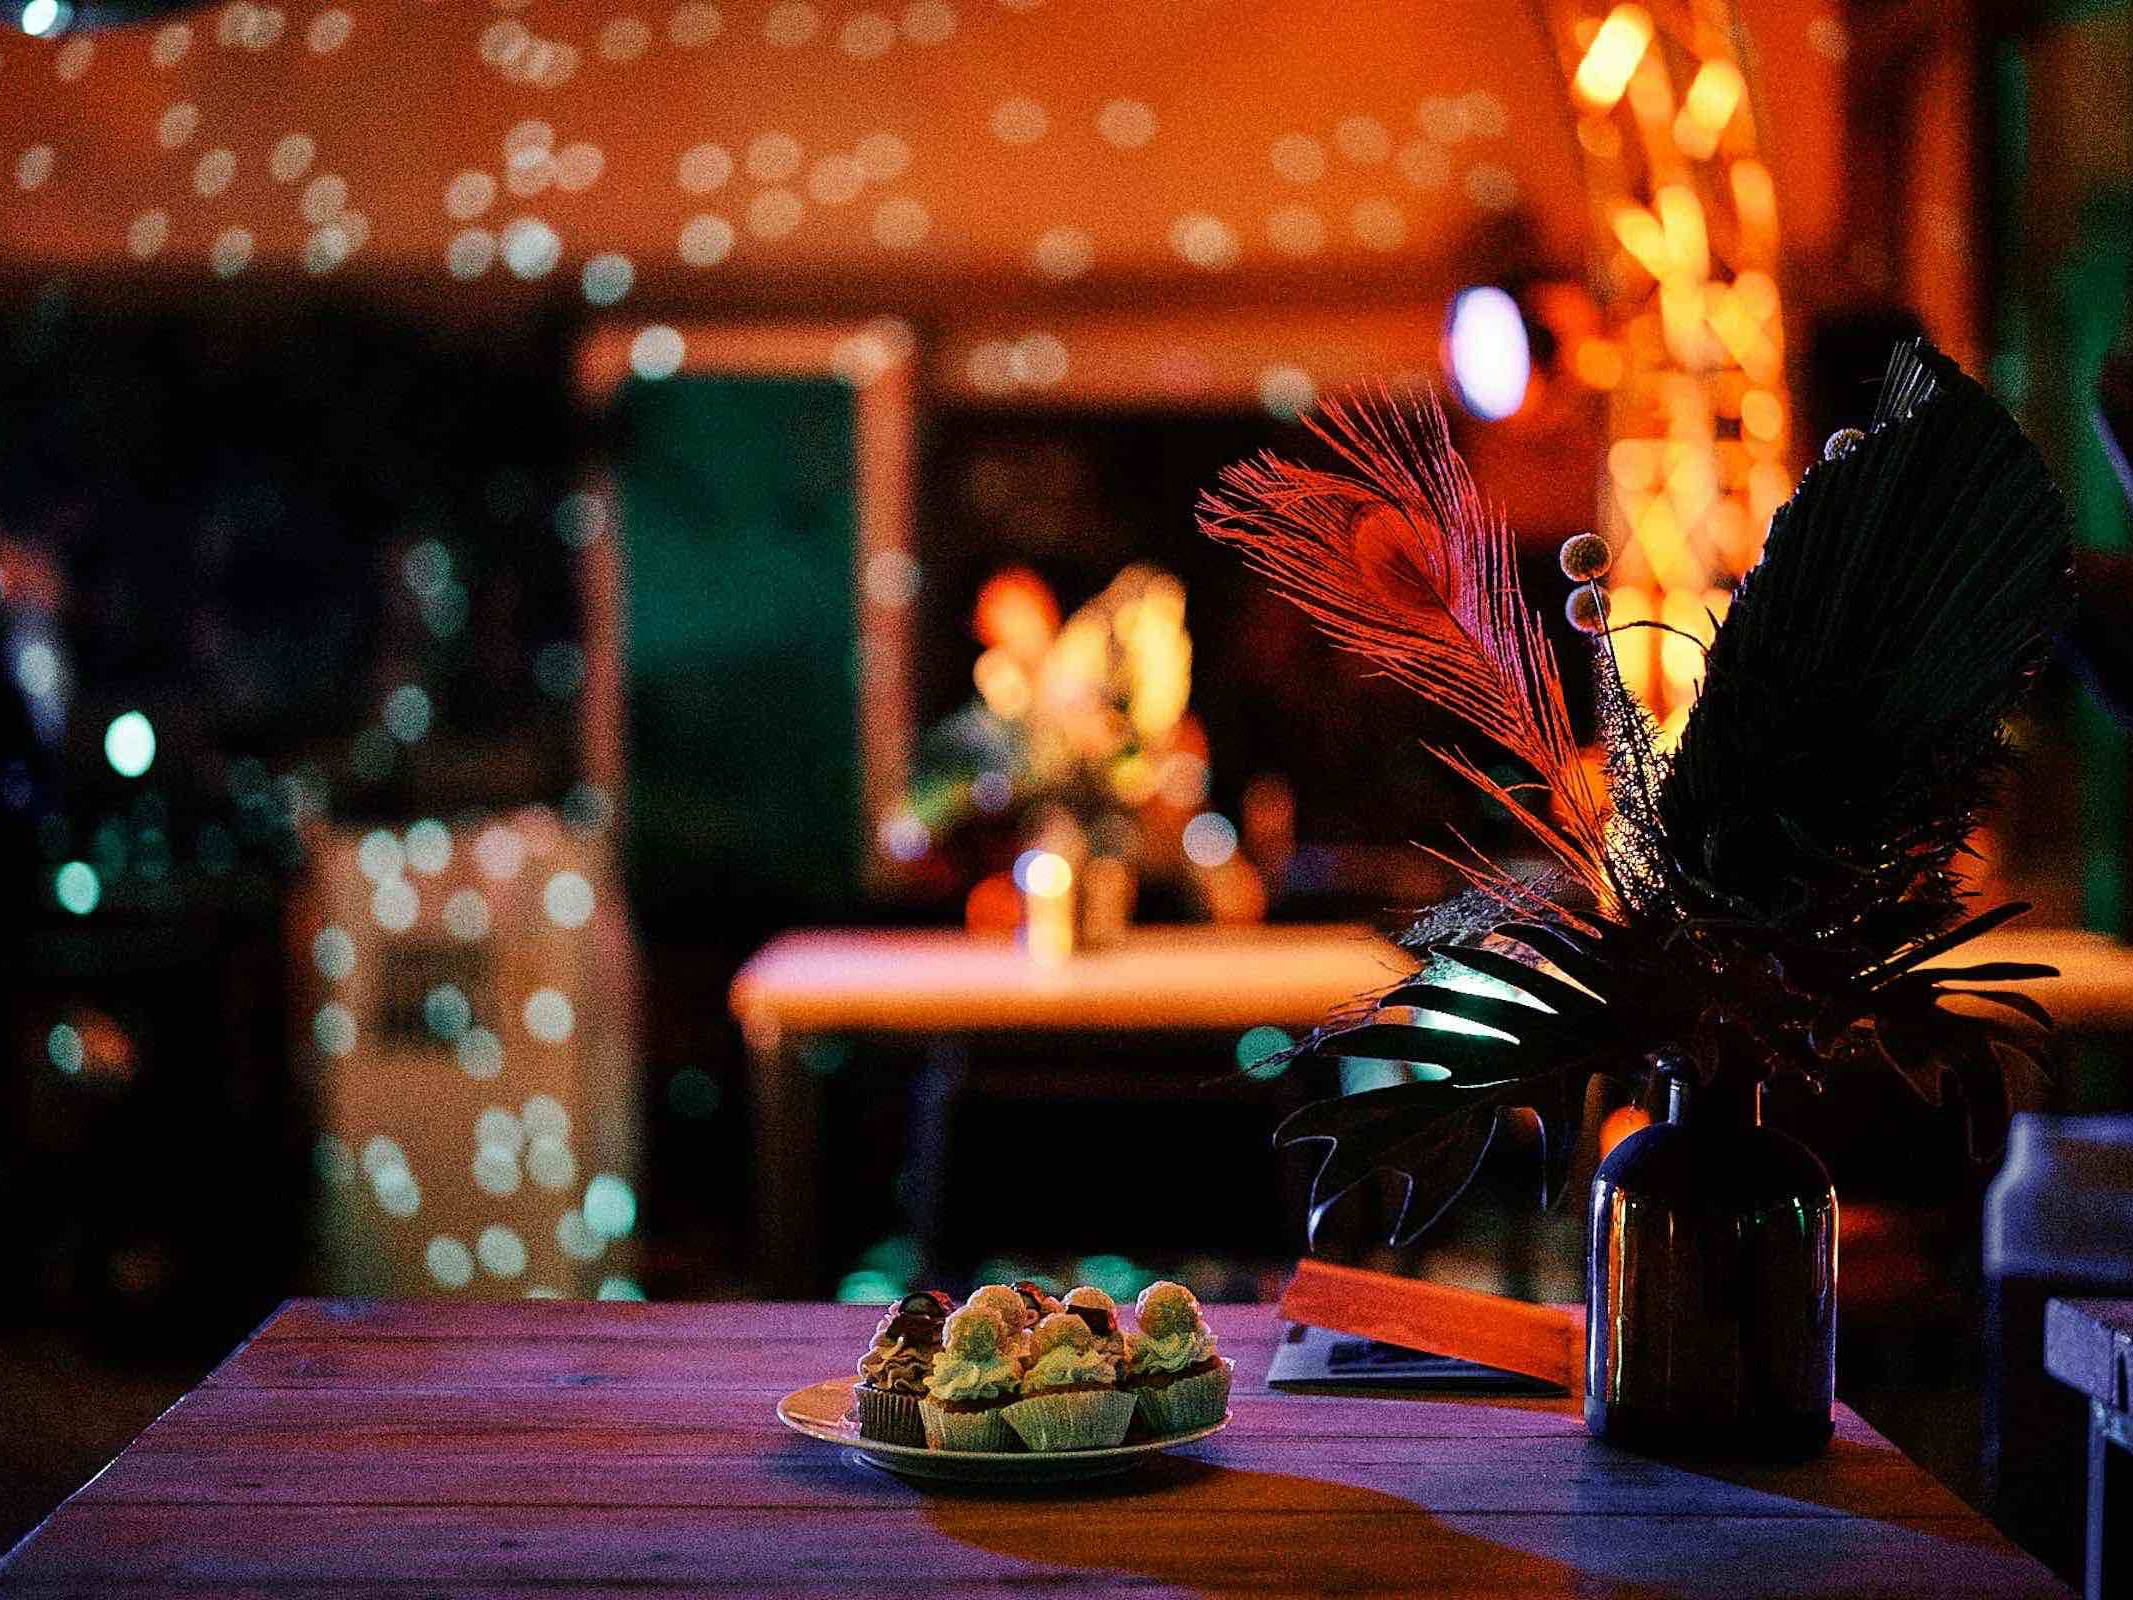 Eventplanung | Eventausstatung | Event | Miet | Service | Hannover | Kongresse | Galas | Shows | Modenschauen | Bühnen | Licht | Tontechnik | Logistik | Dekoration | Catering | Programmgestaltung | Künstler